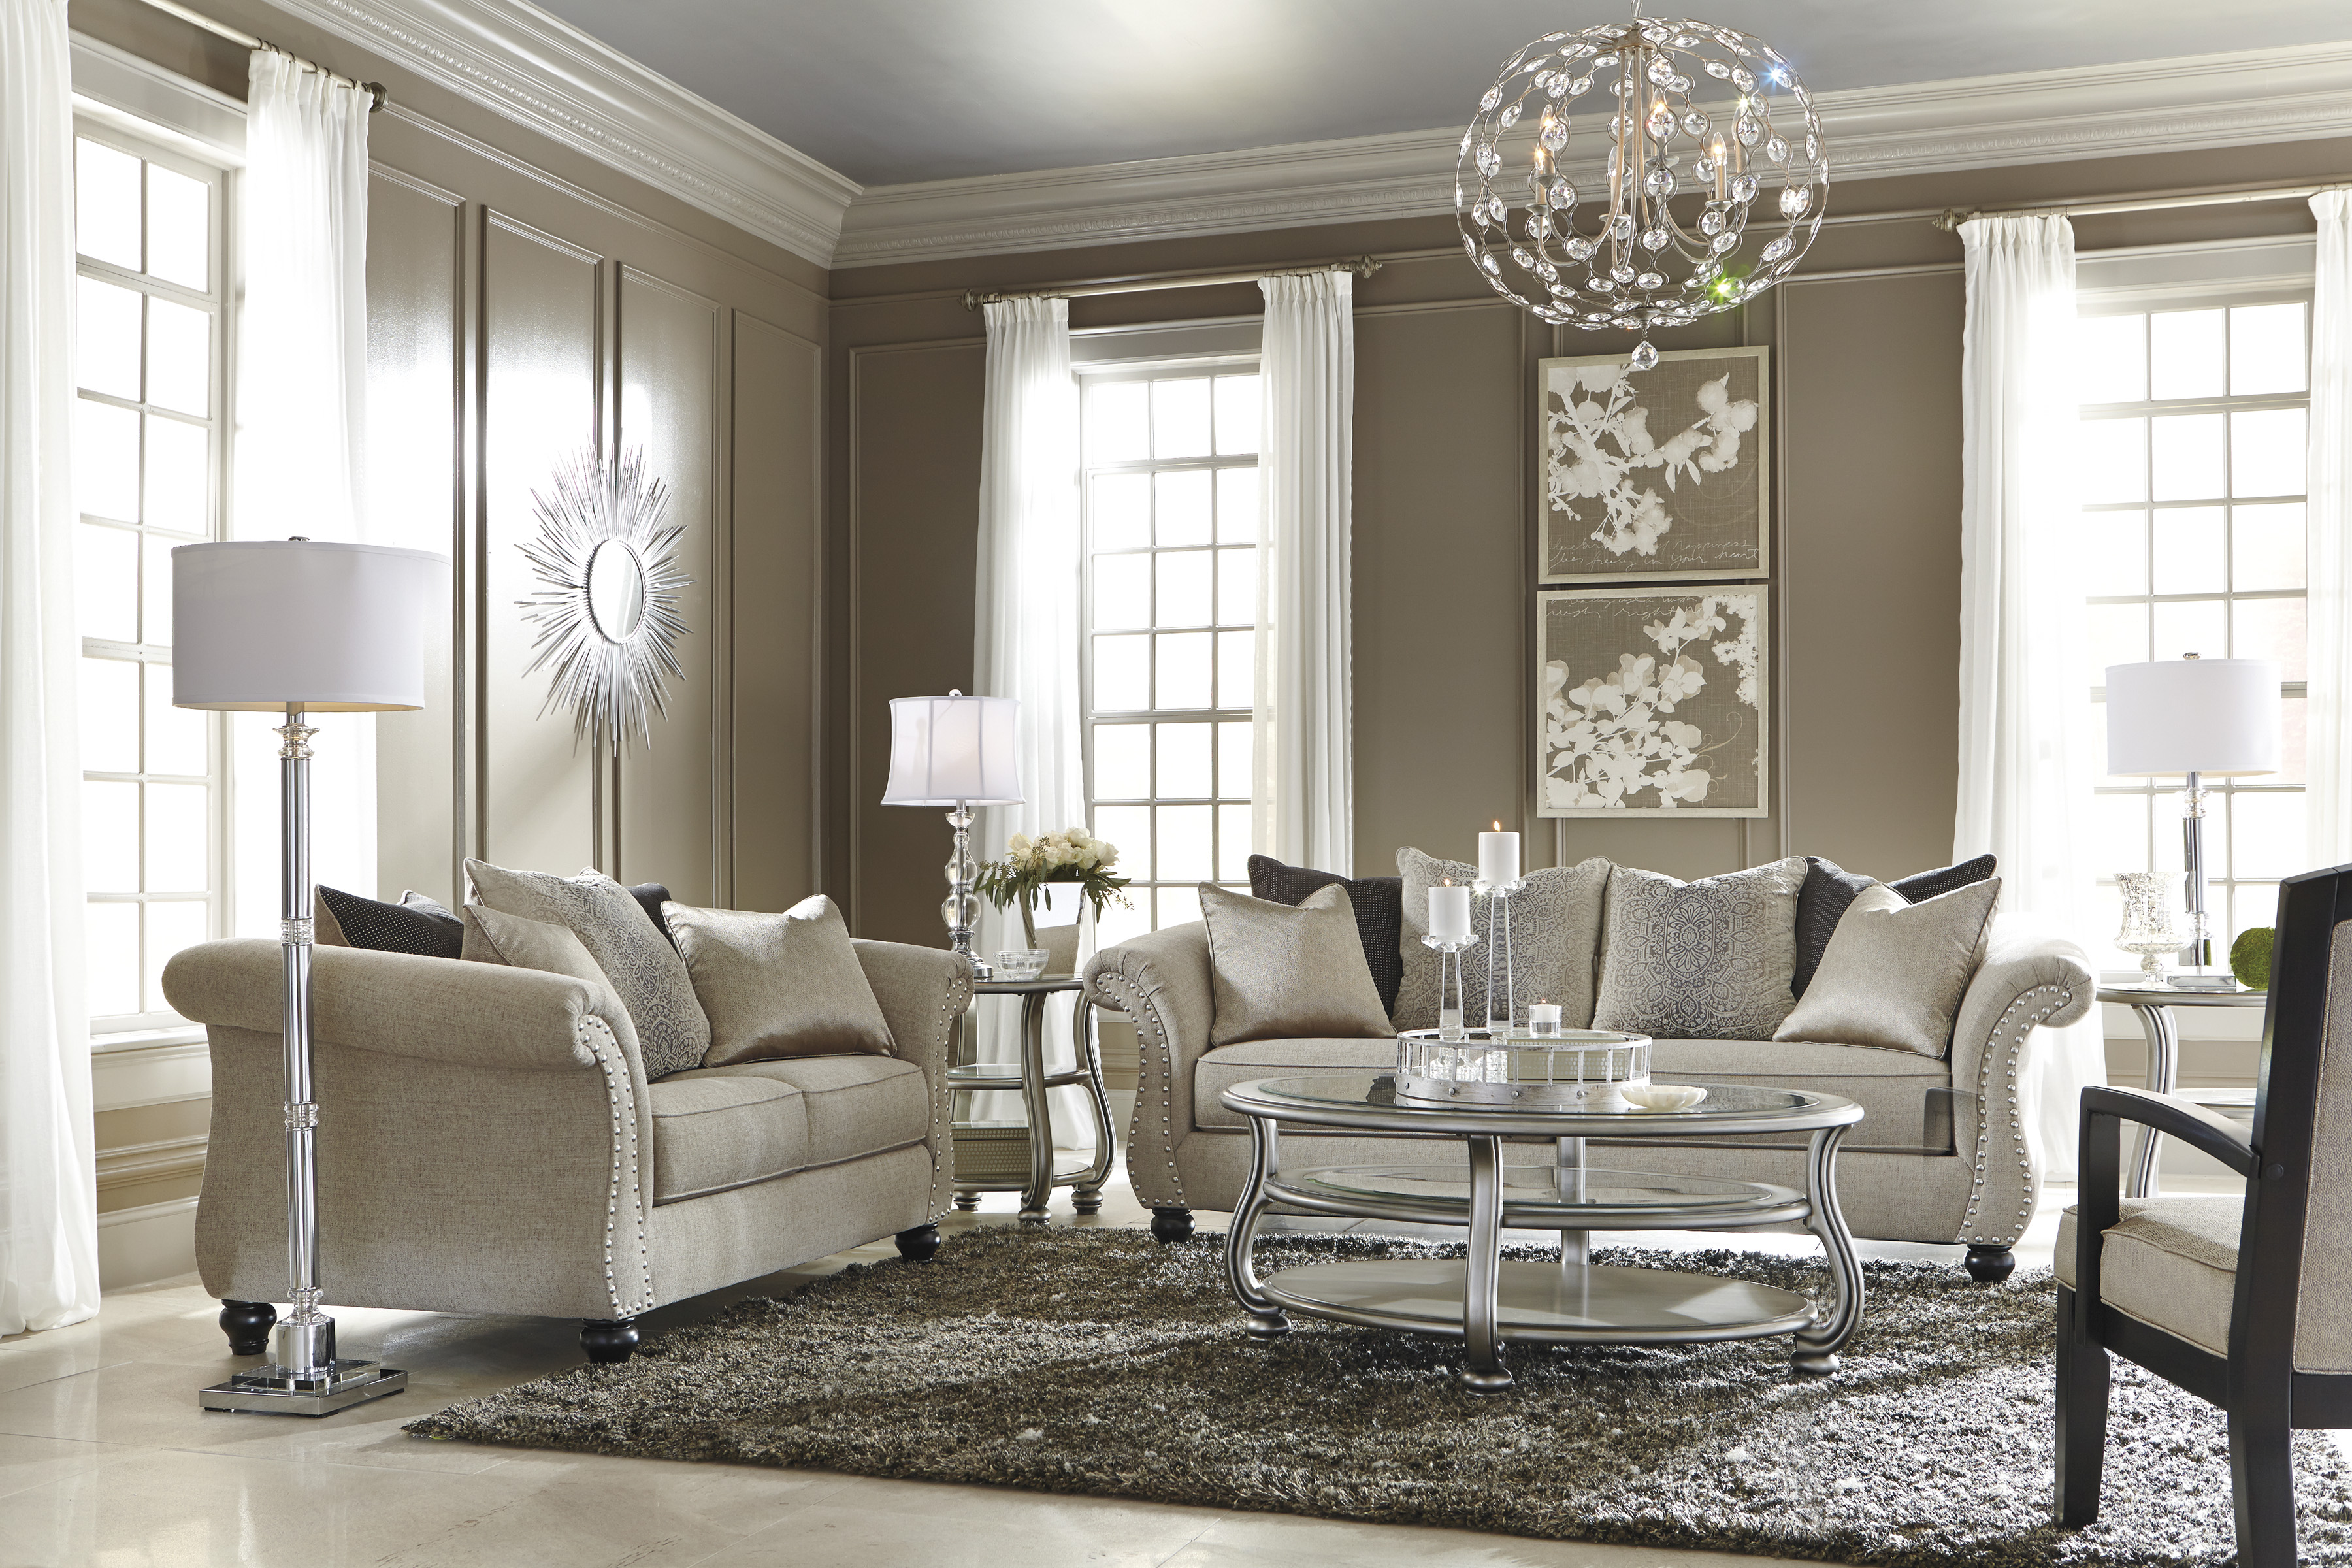 Grand Elegance: The Inspiration - Ashley Furniture HomeStore Blog